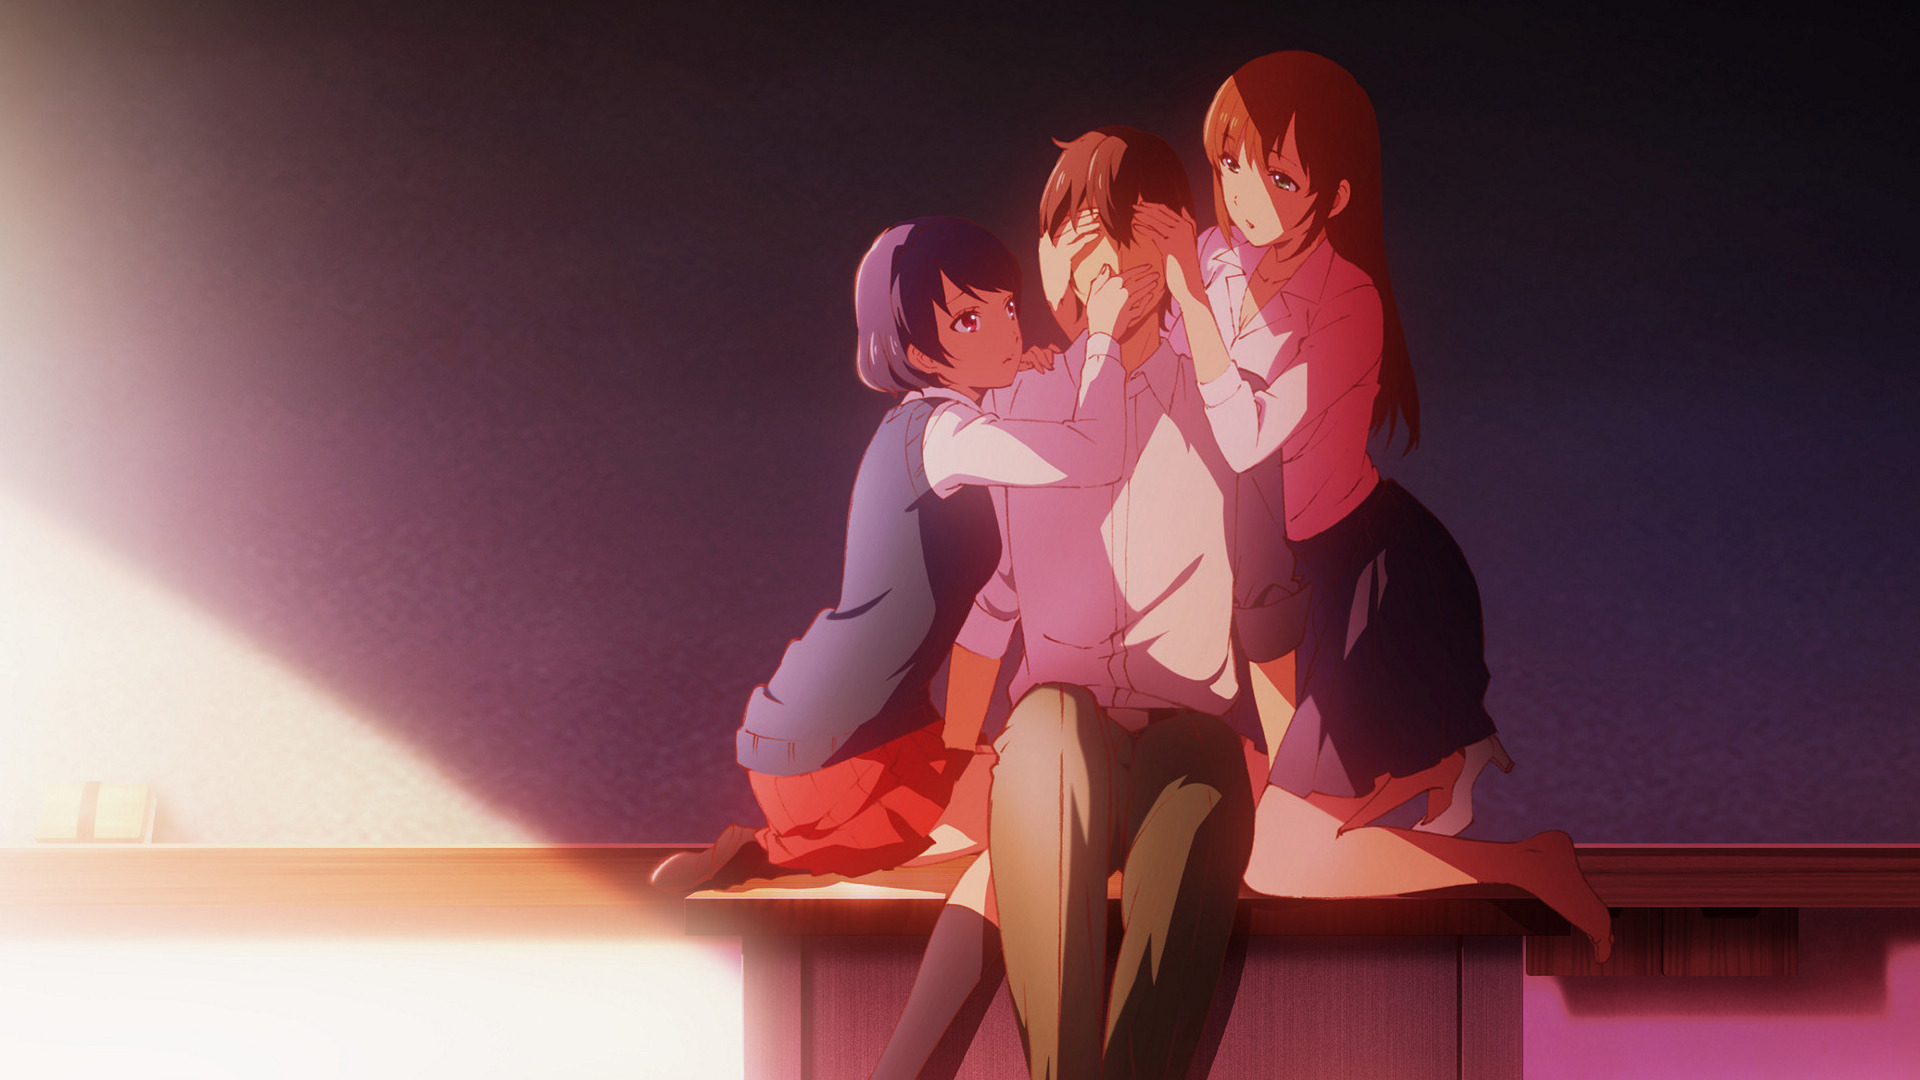 Anime Dome x Kano